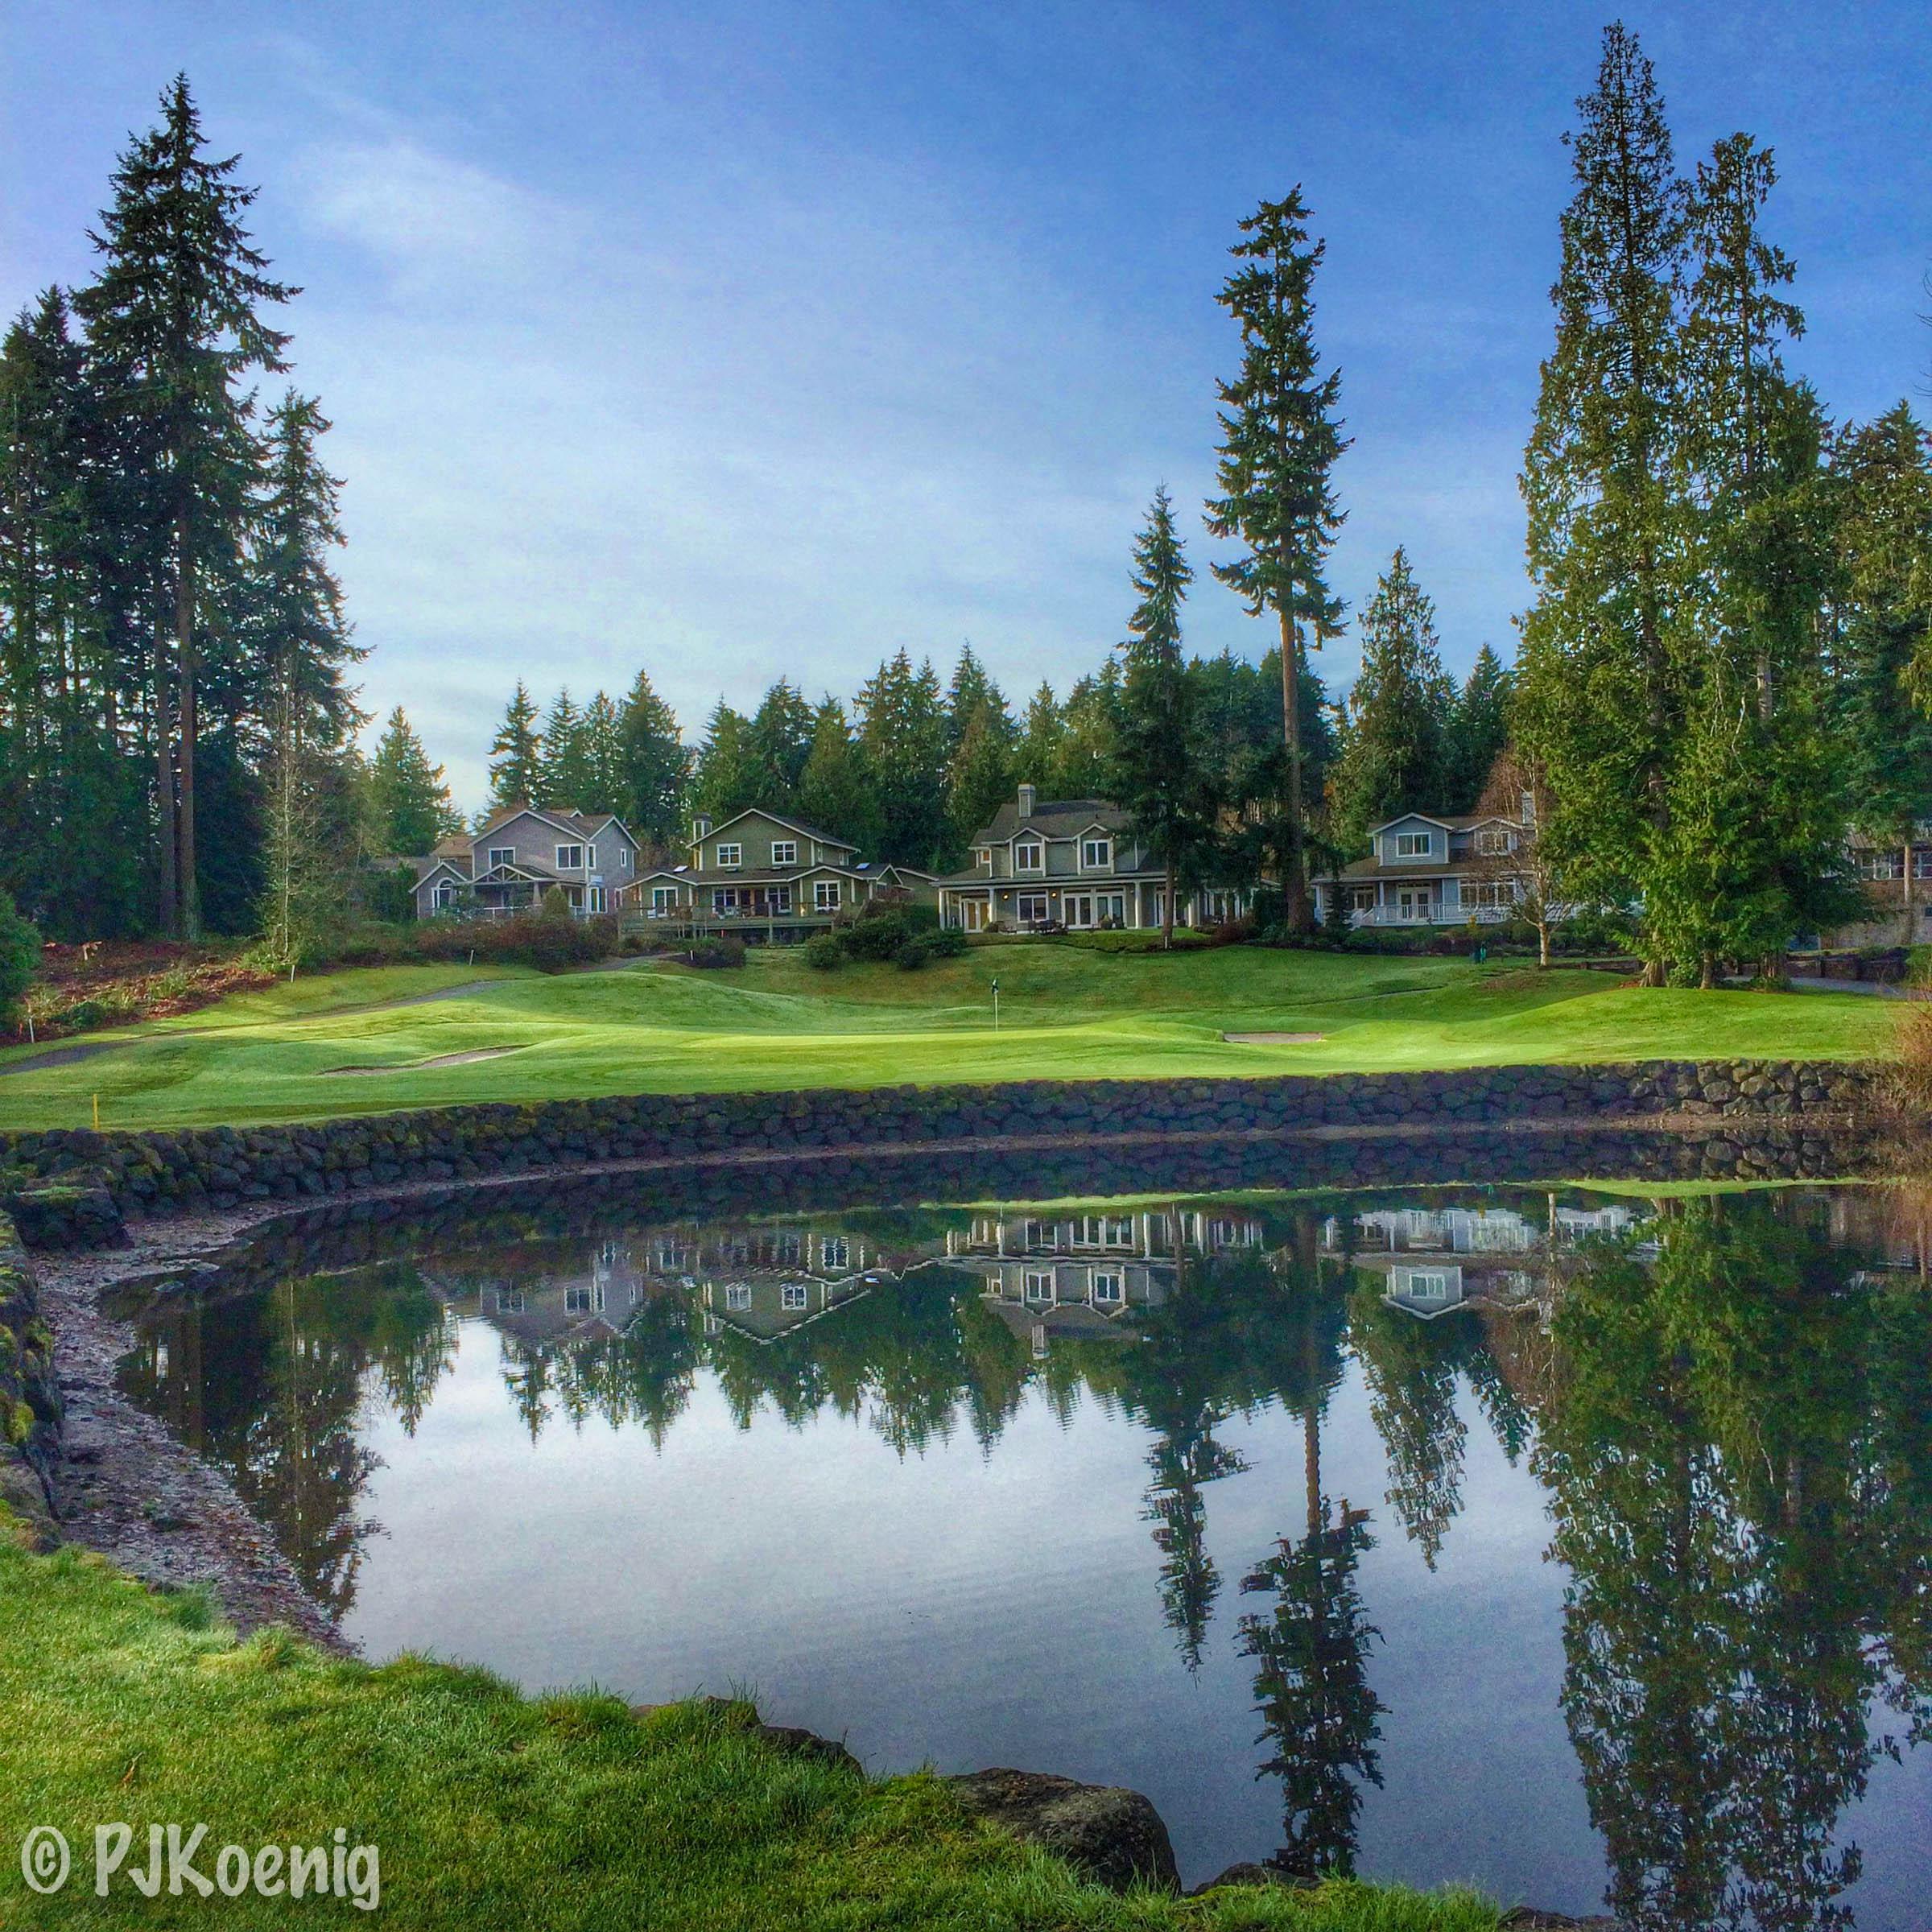 Wing Point Golf and Country Club - Bainbridge Island, WA